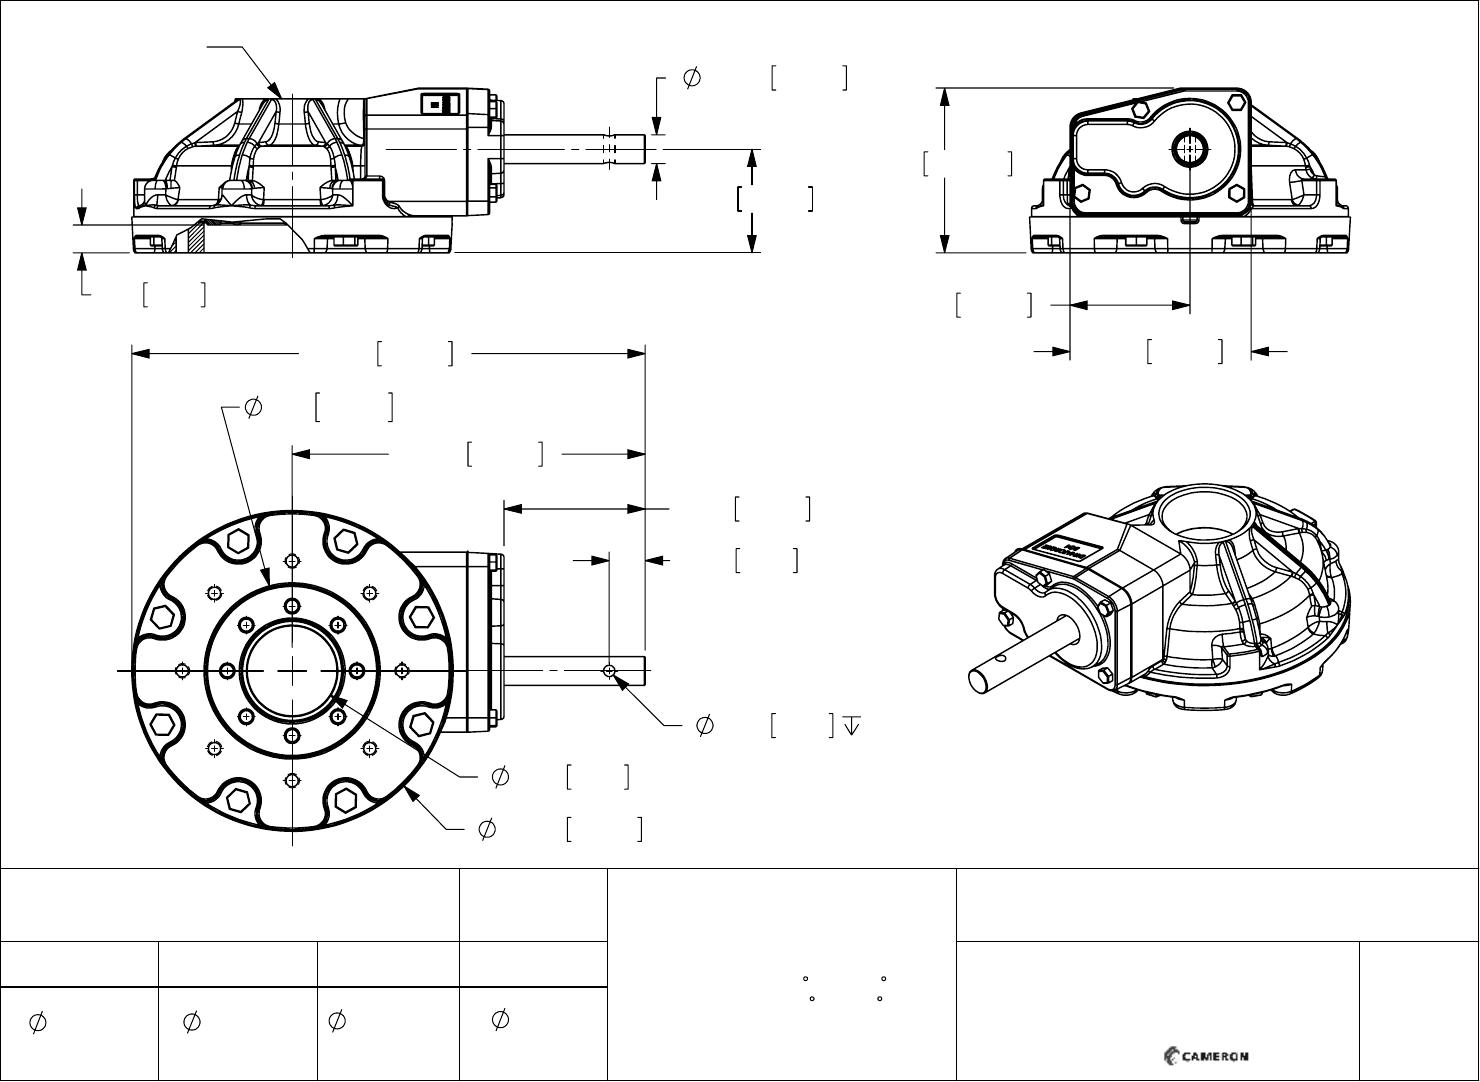 7D 22 4XX_BG4 DYNATORQUE Multi Turn Bevel Gear Operators